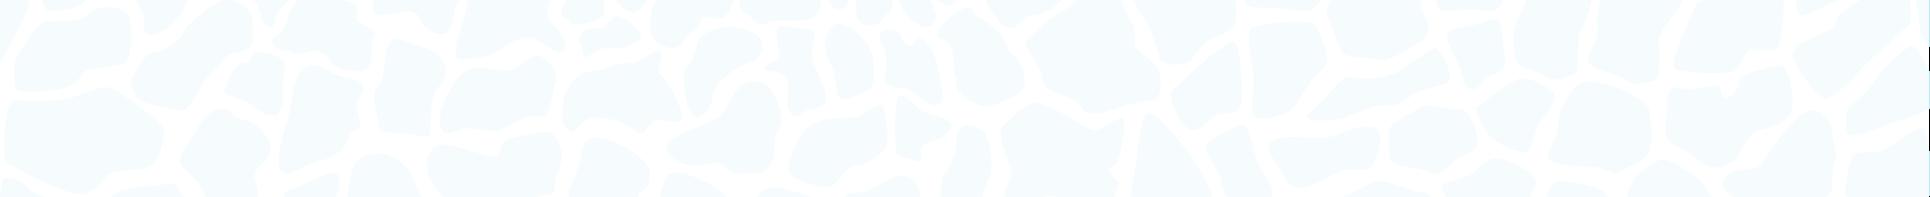 giraffe-pattern-shallow